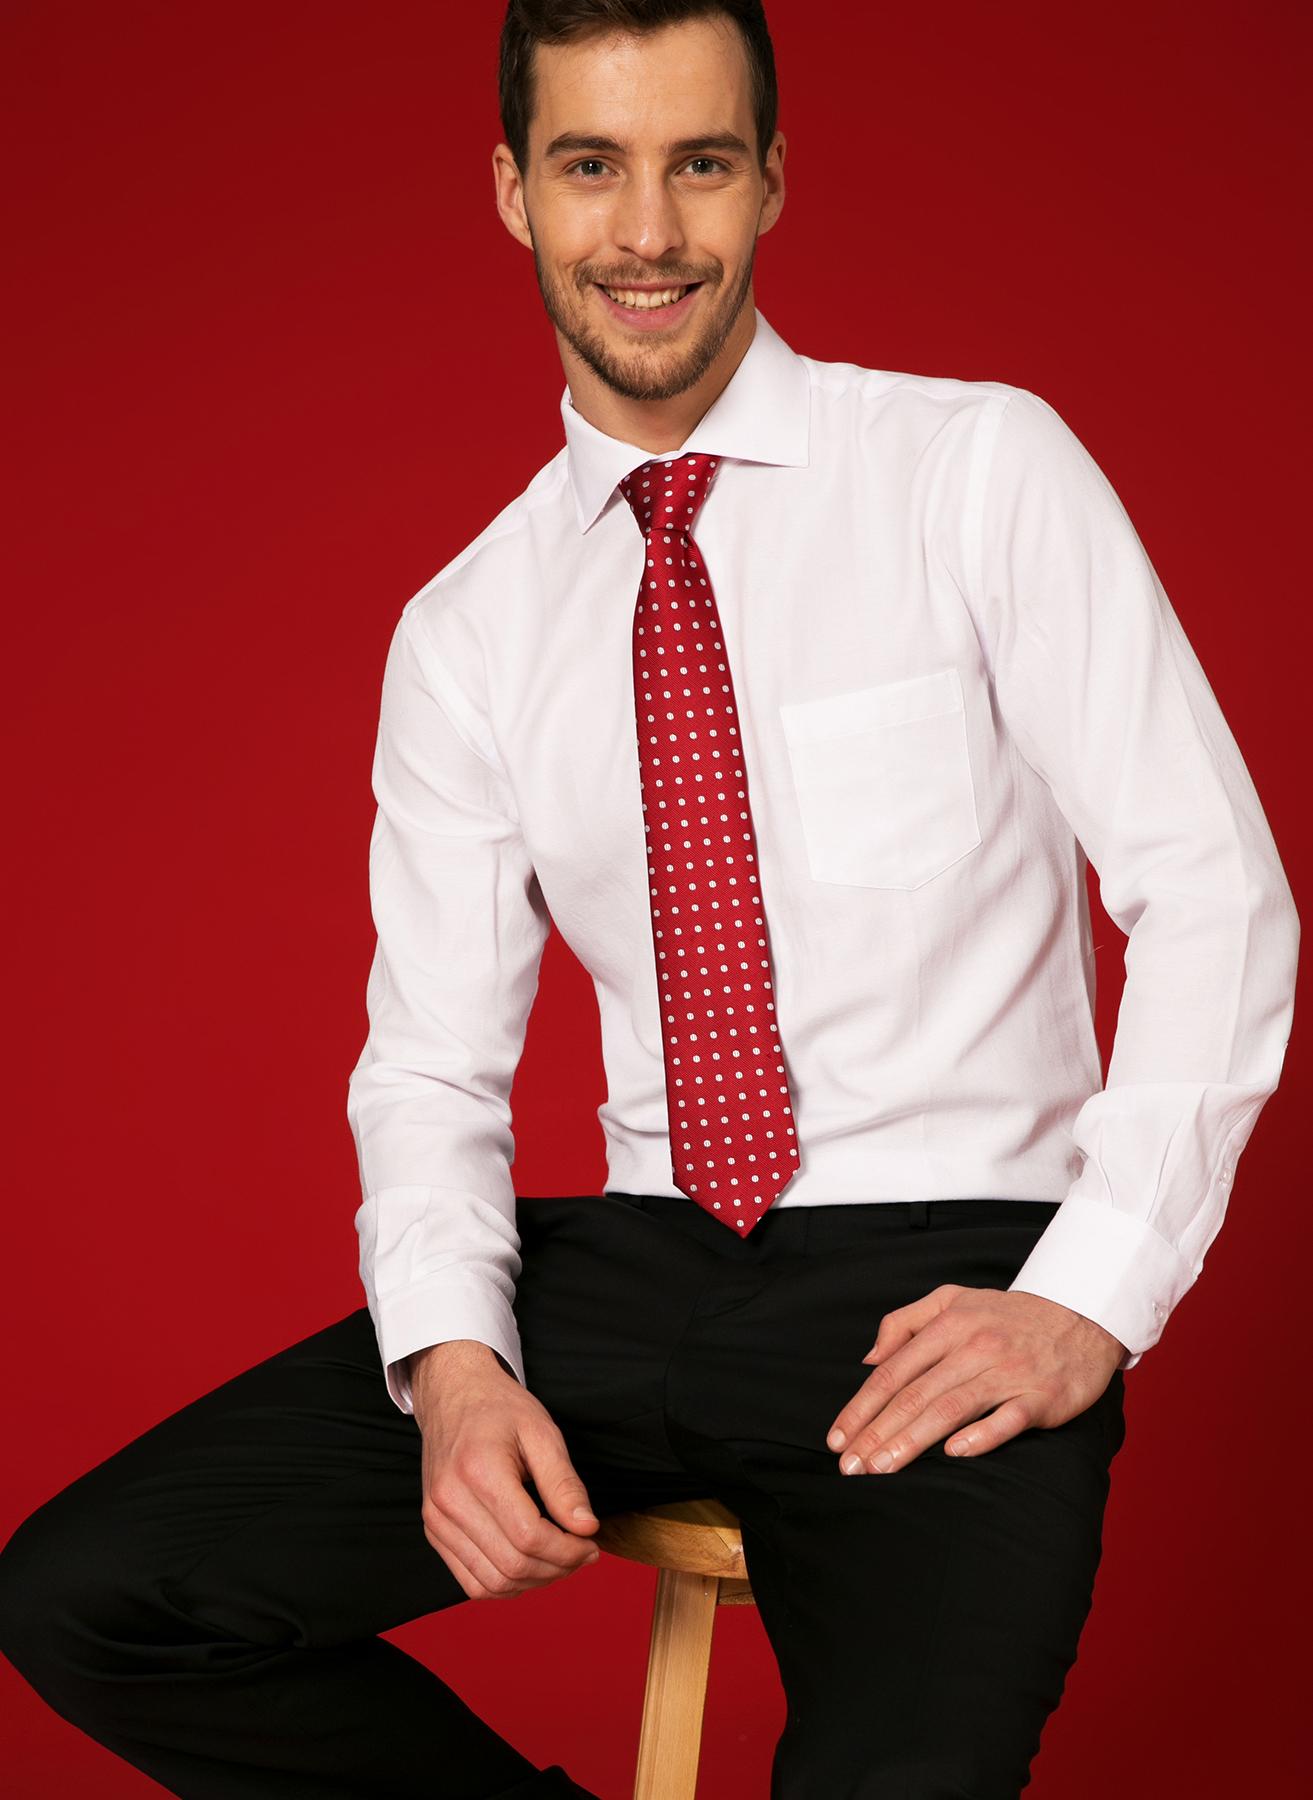 George Hogg Comfort Fit Beyaz Gömlek 43 5000219323001 Ürün Resmi